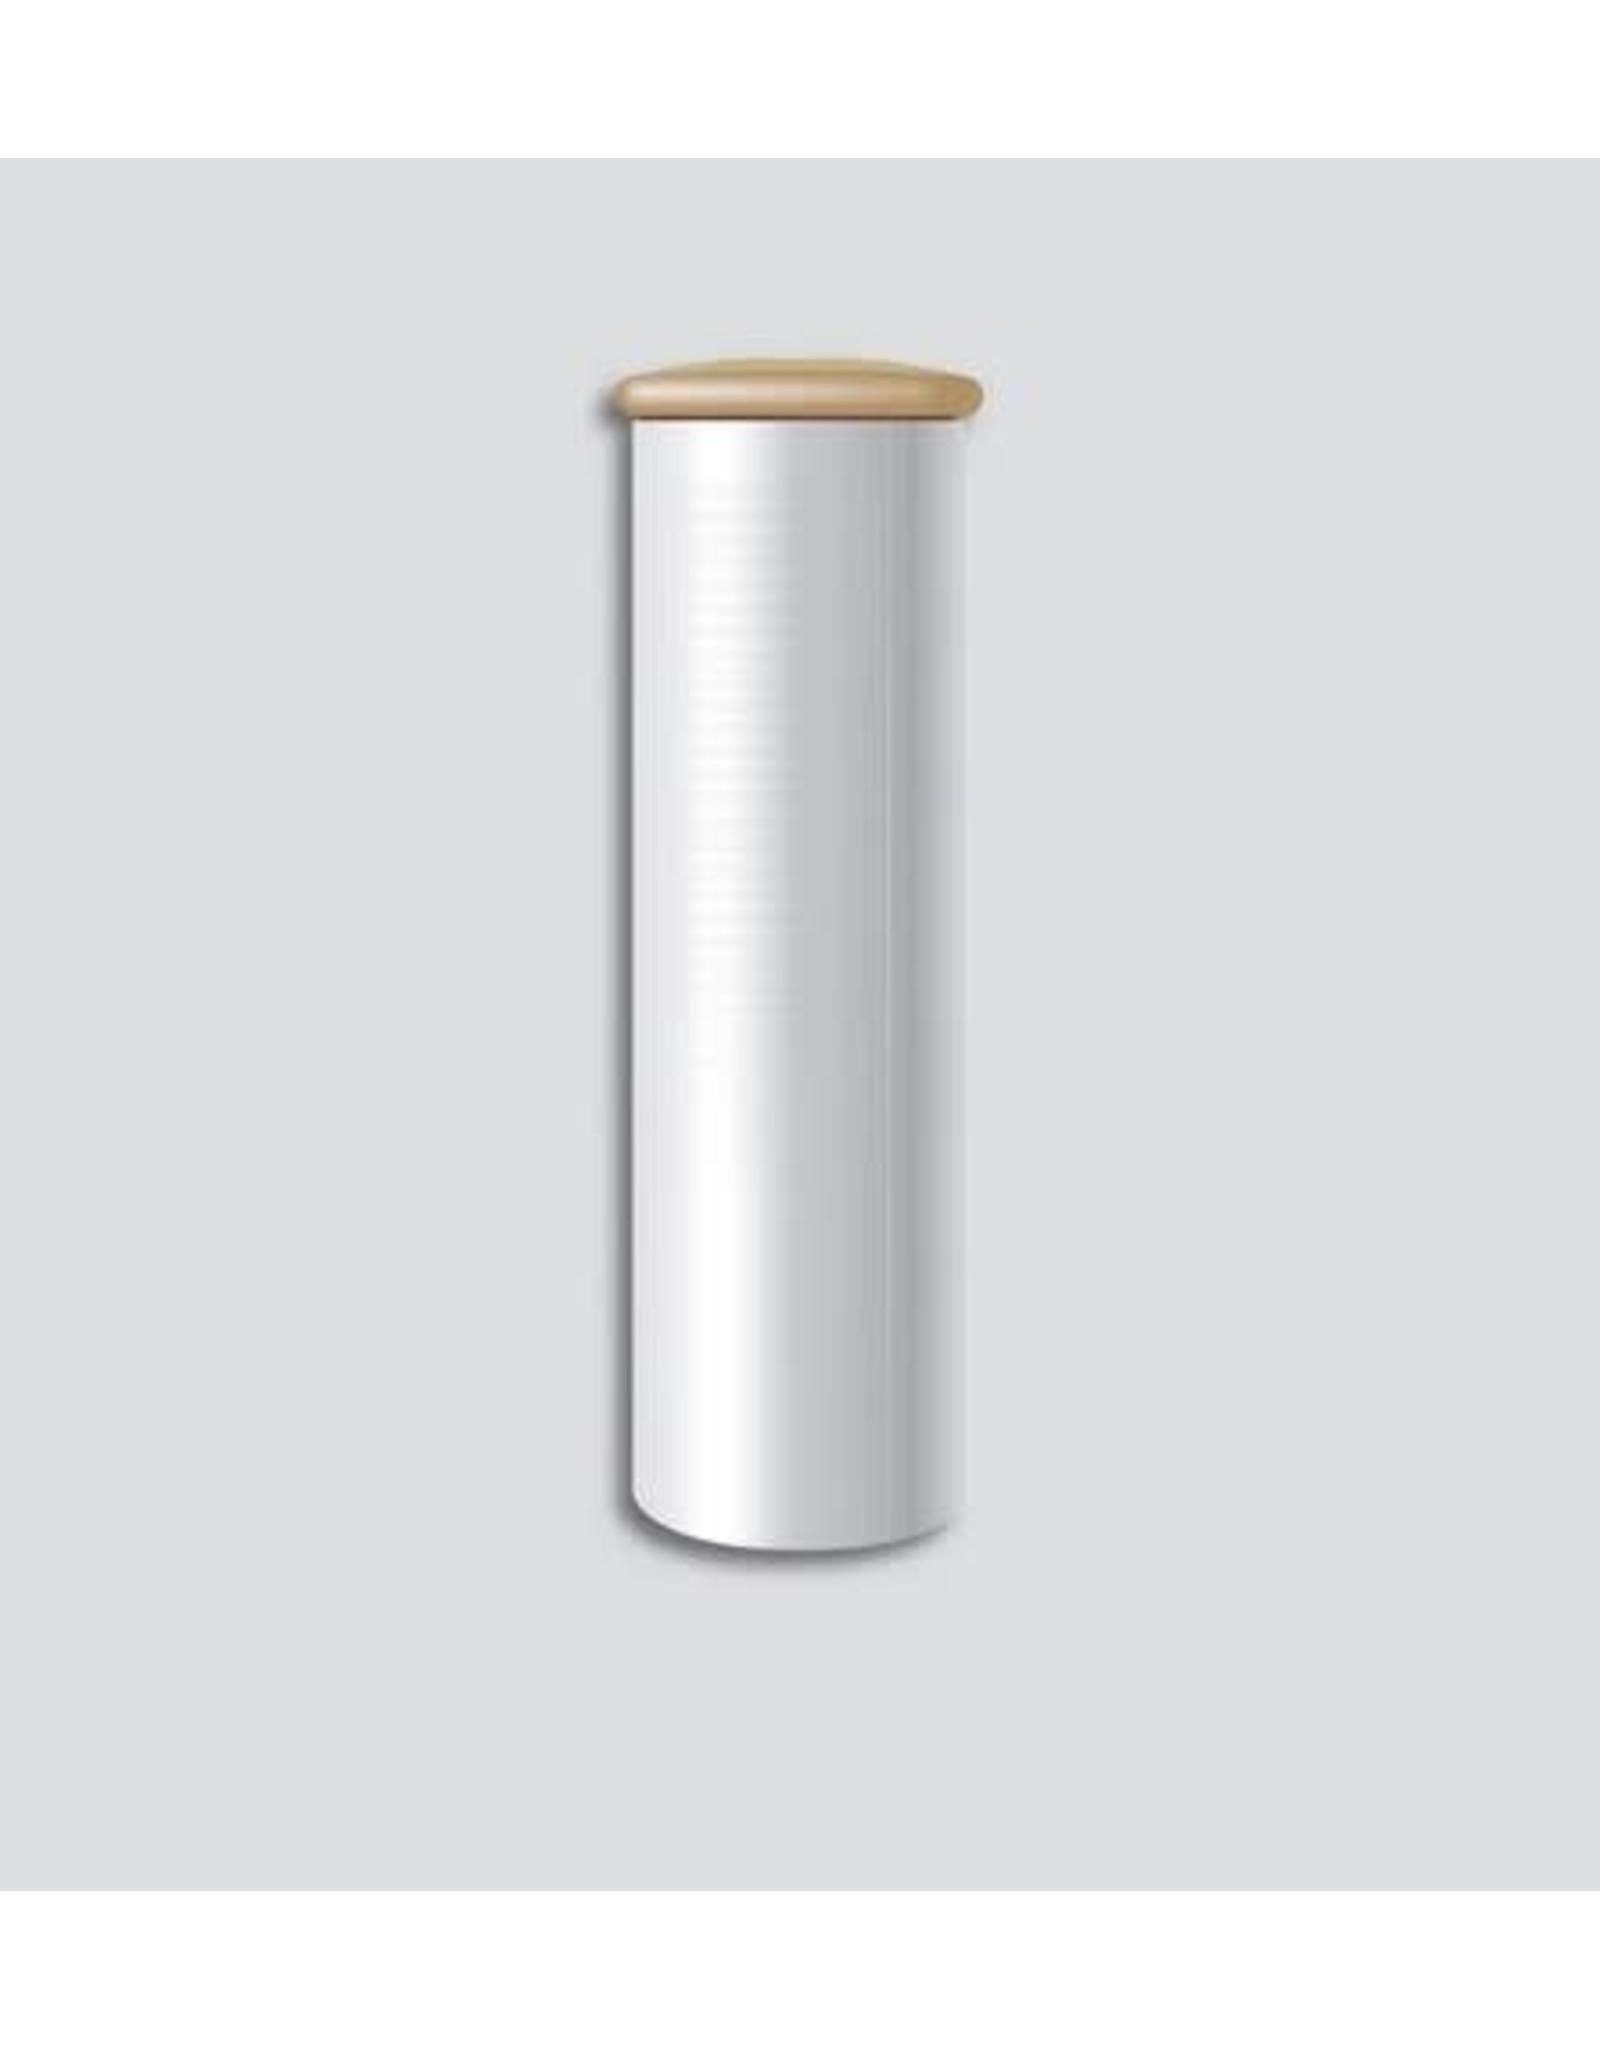 FLINT FLINT METALLIC REFILL